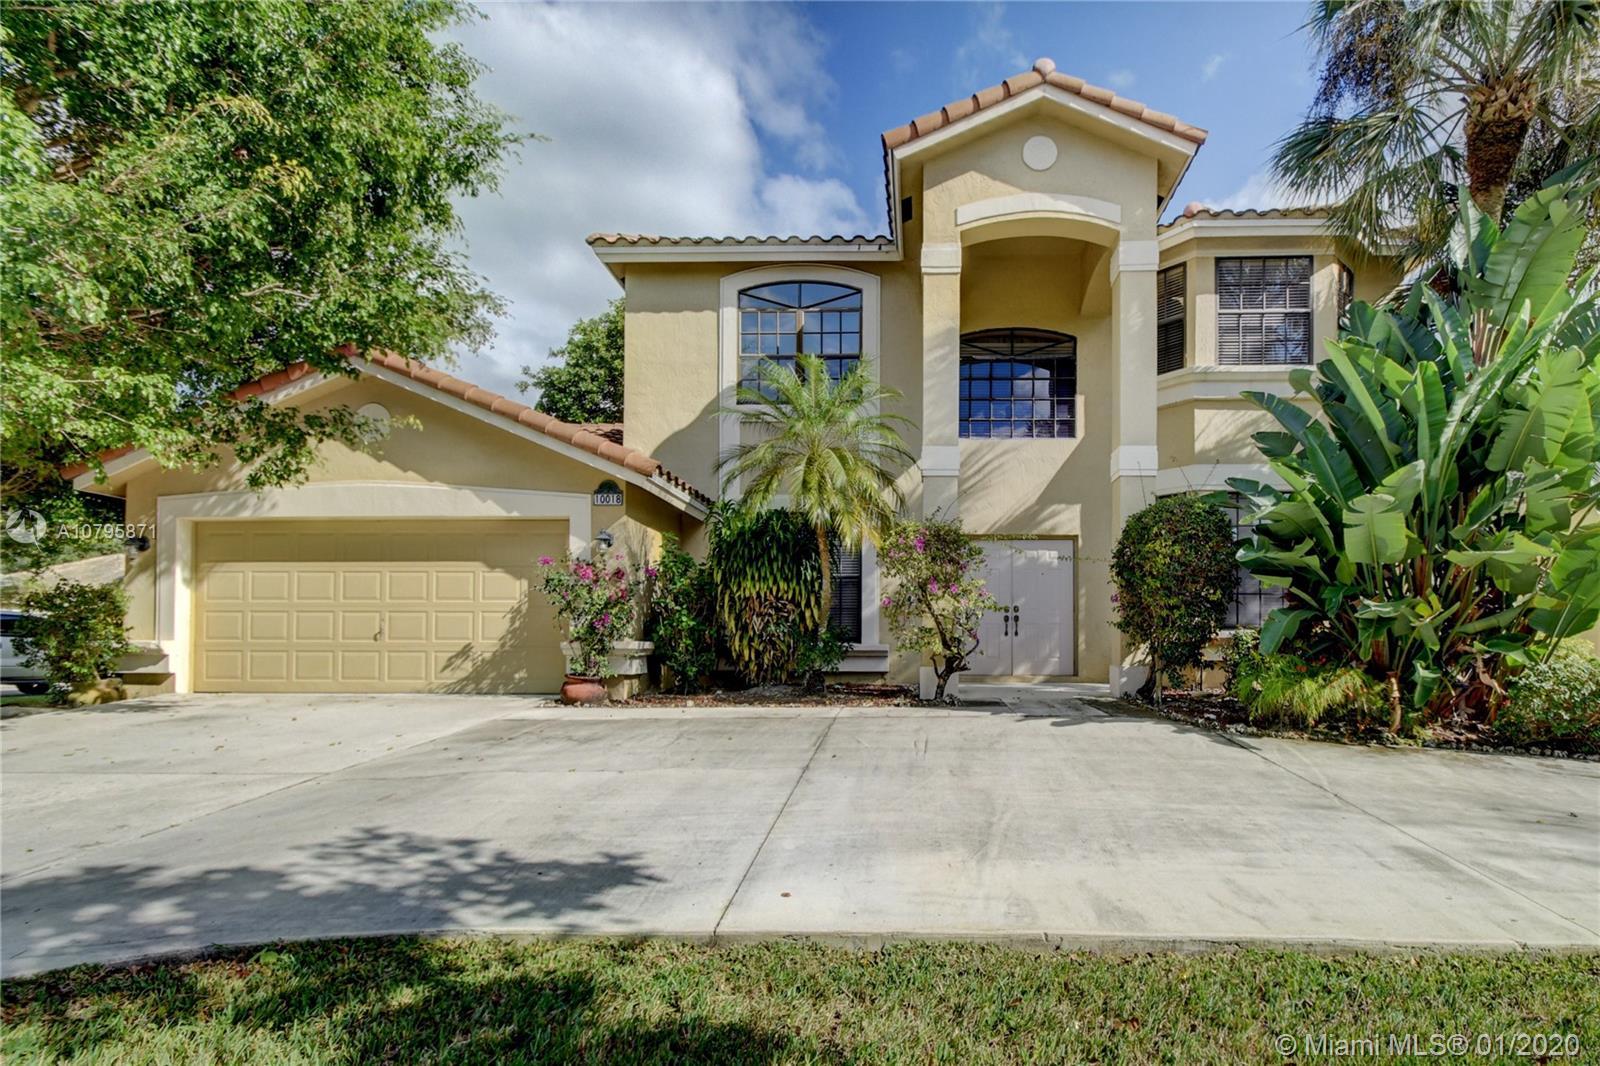 10018 Lexington Estates Blvd, Boca Raton, FL 33428